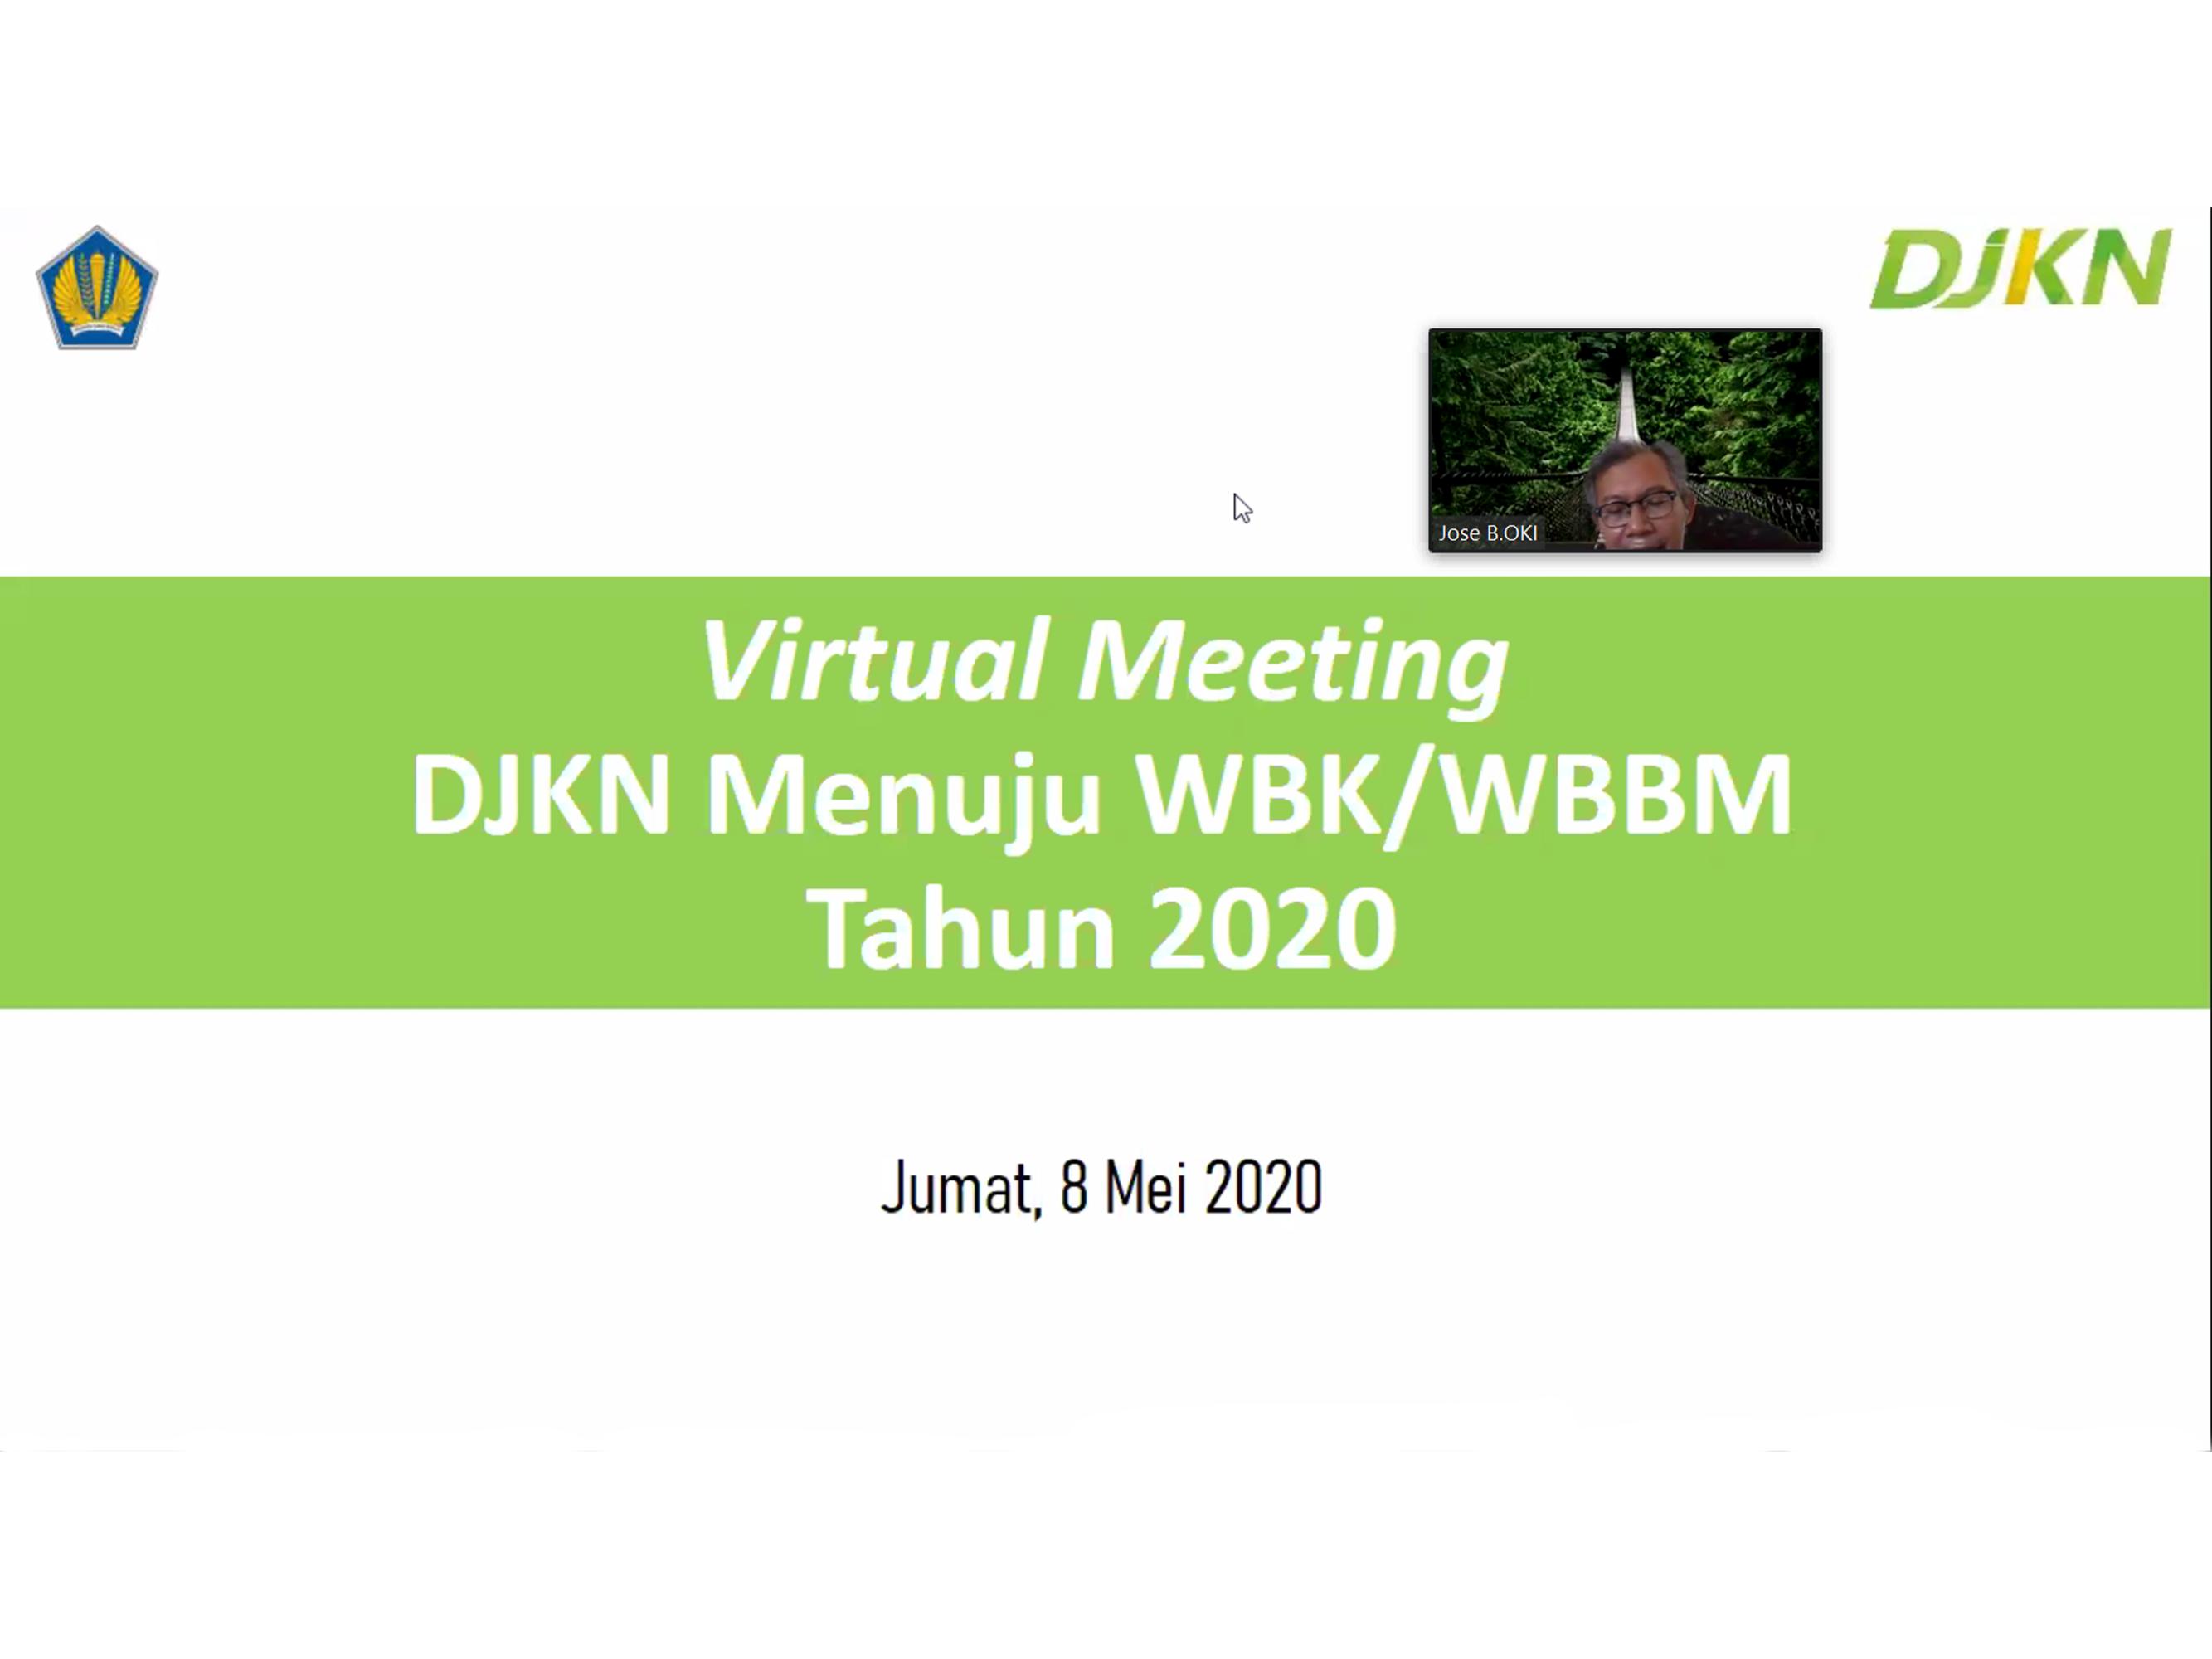 KPKNL Serang Ikuti Kegiatan Monitoring Pembangunan ZI WBK/WBBM Tahun 2020